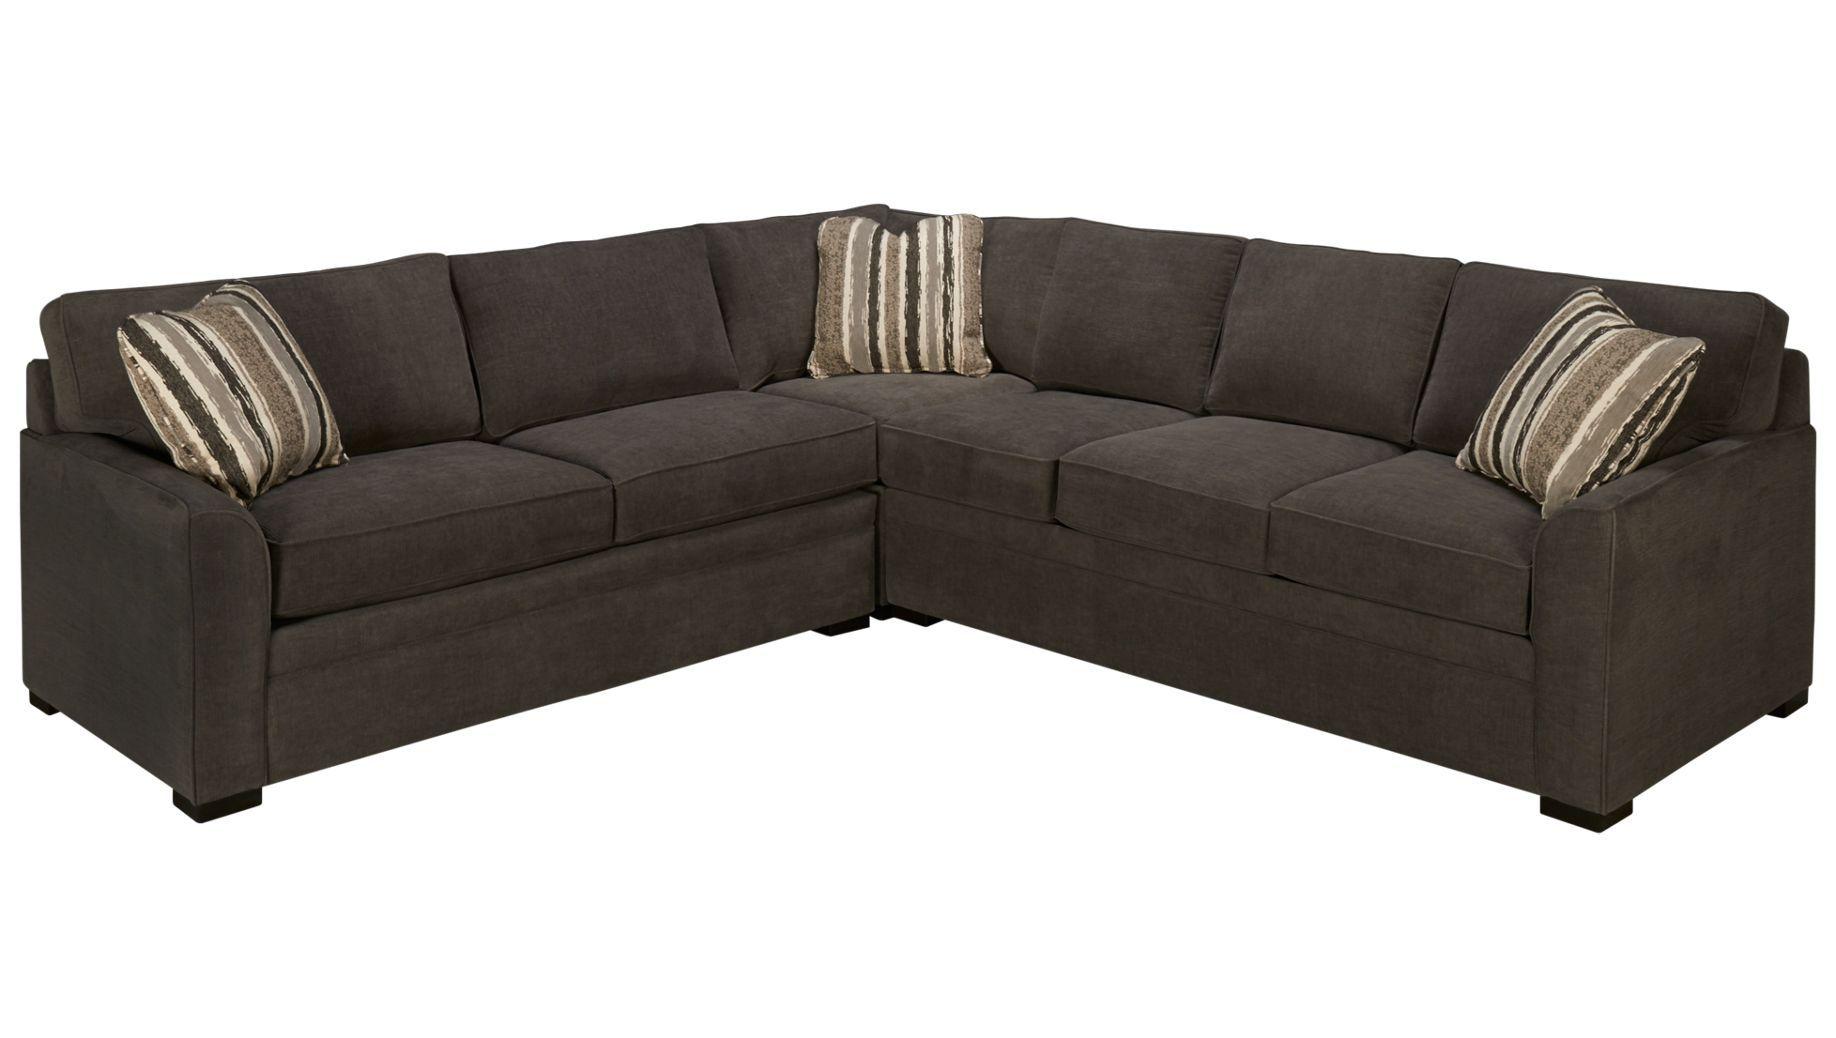 Jordan S Furniture Sleeper Sofa.Jonathan Louis Sleepers Sleepers 3 Piece Sleeper Sectional